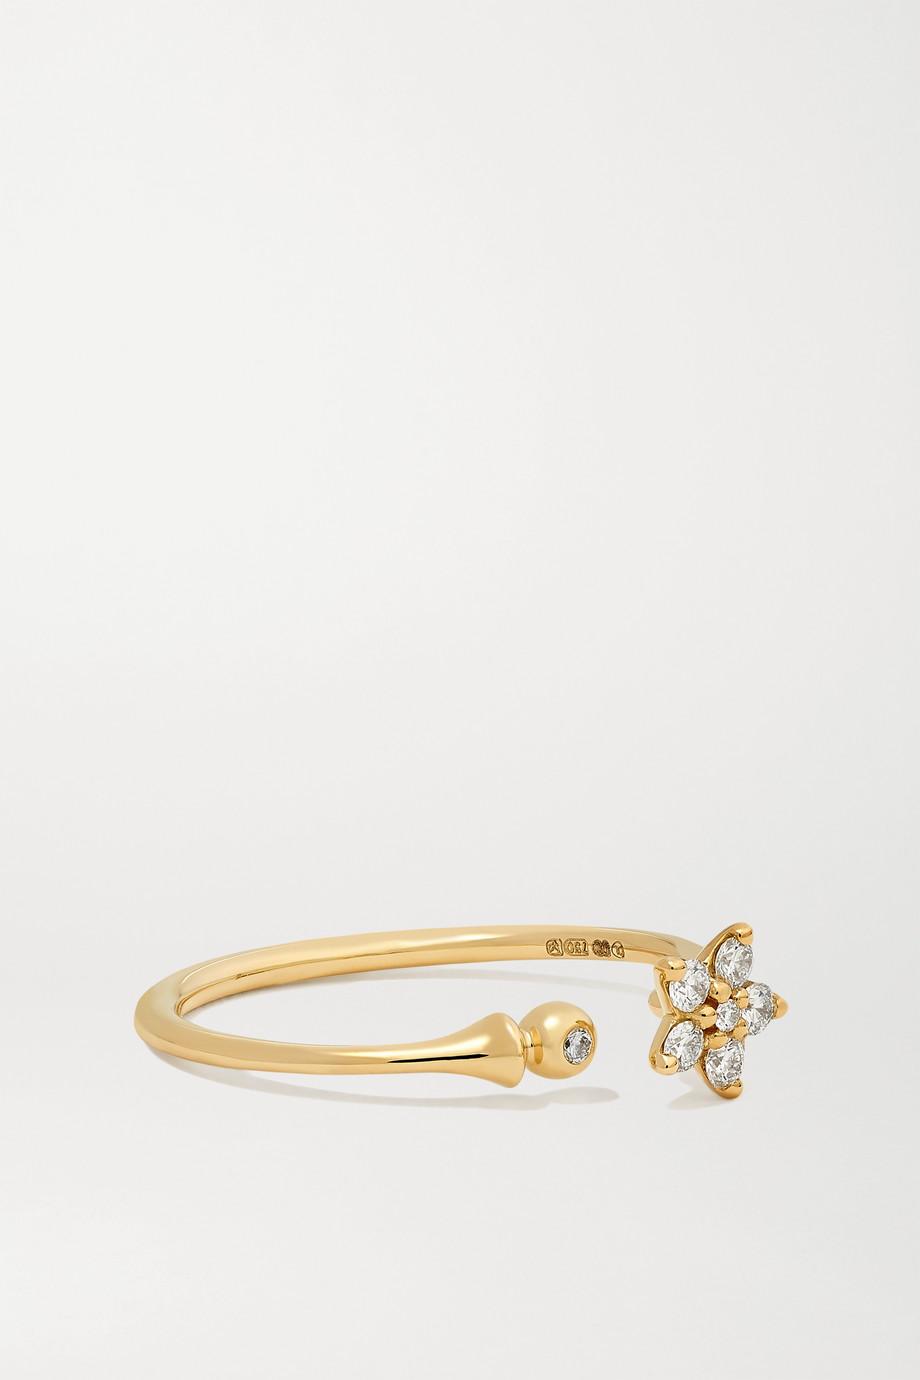 OLE LYNGGAARD COPENHAGEN Shooting Stars 18-karat gold diamond ring